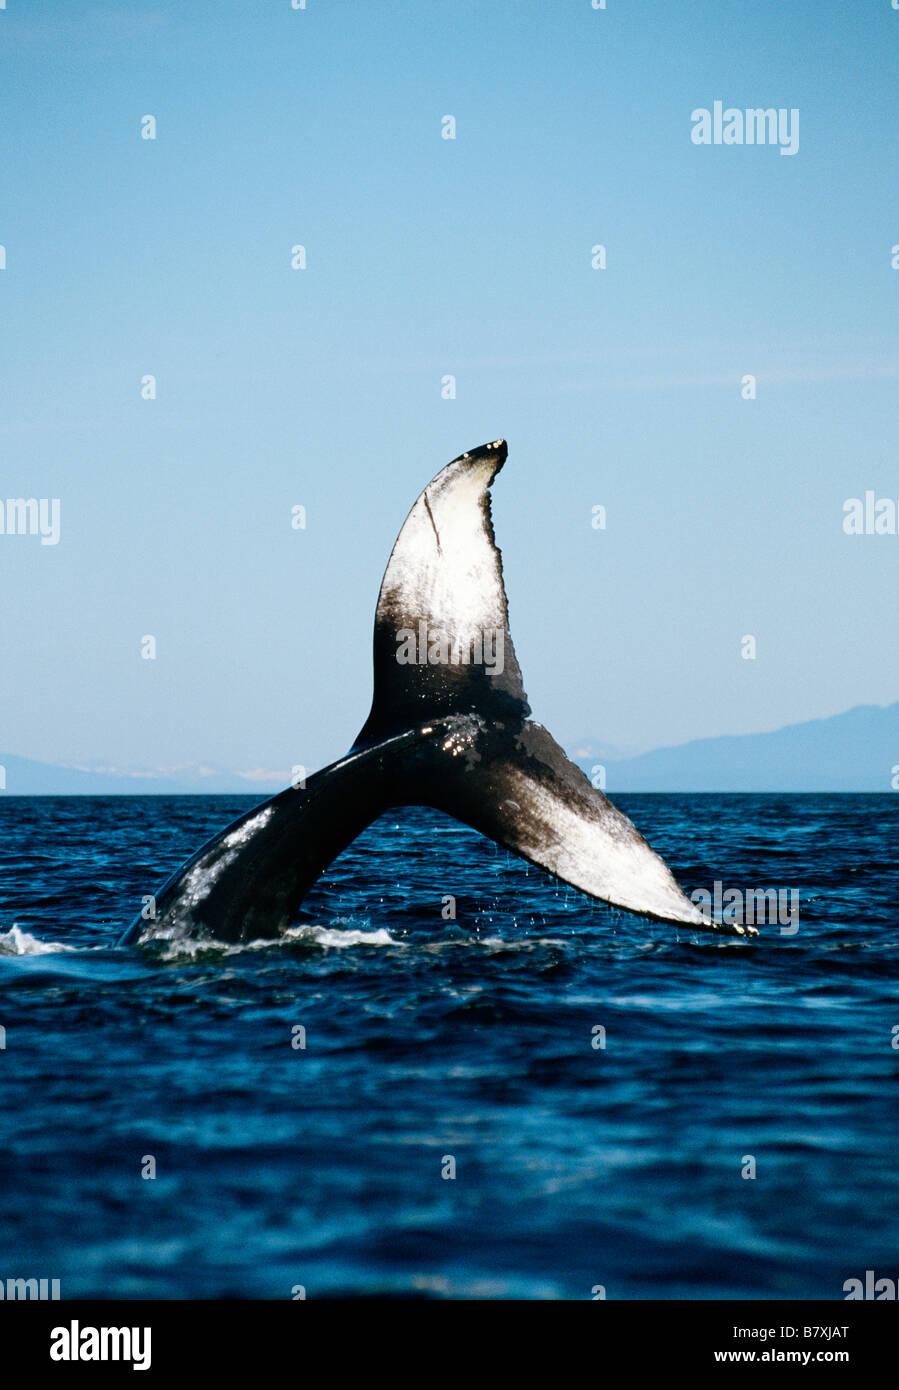 Humpback whale lobtailing, Chatham Strait, Southeast Alaska - Stock Image